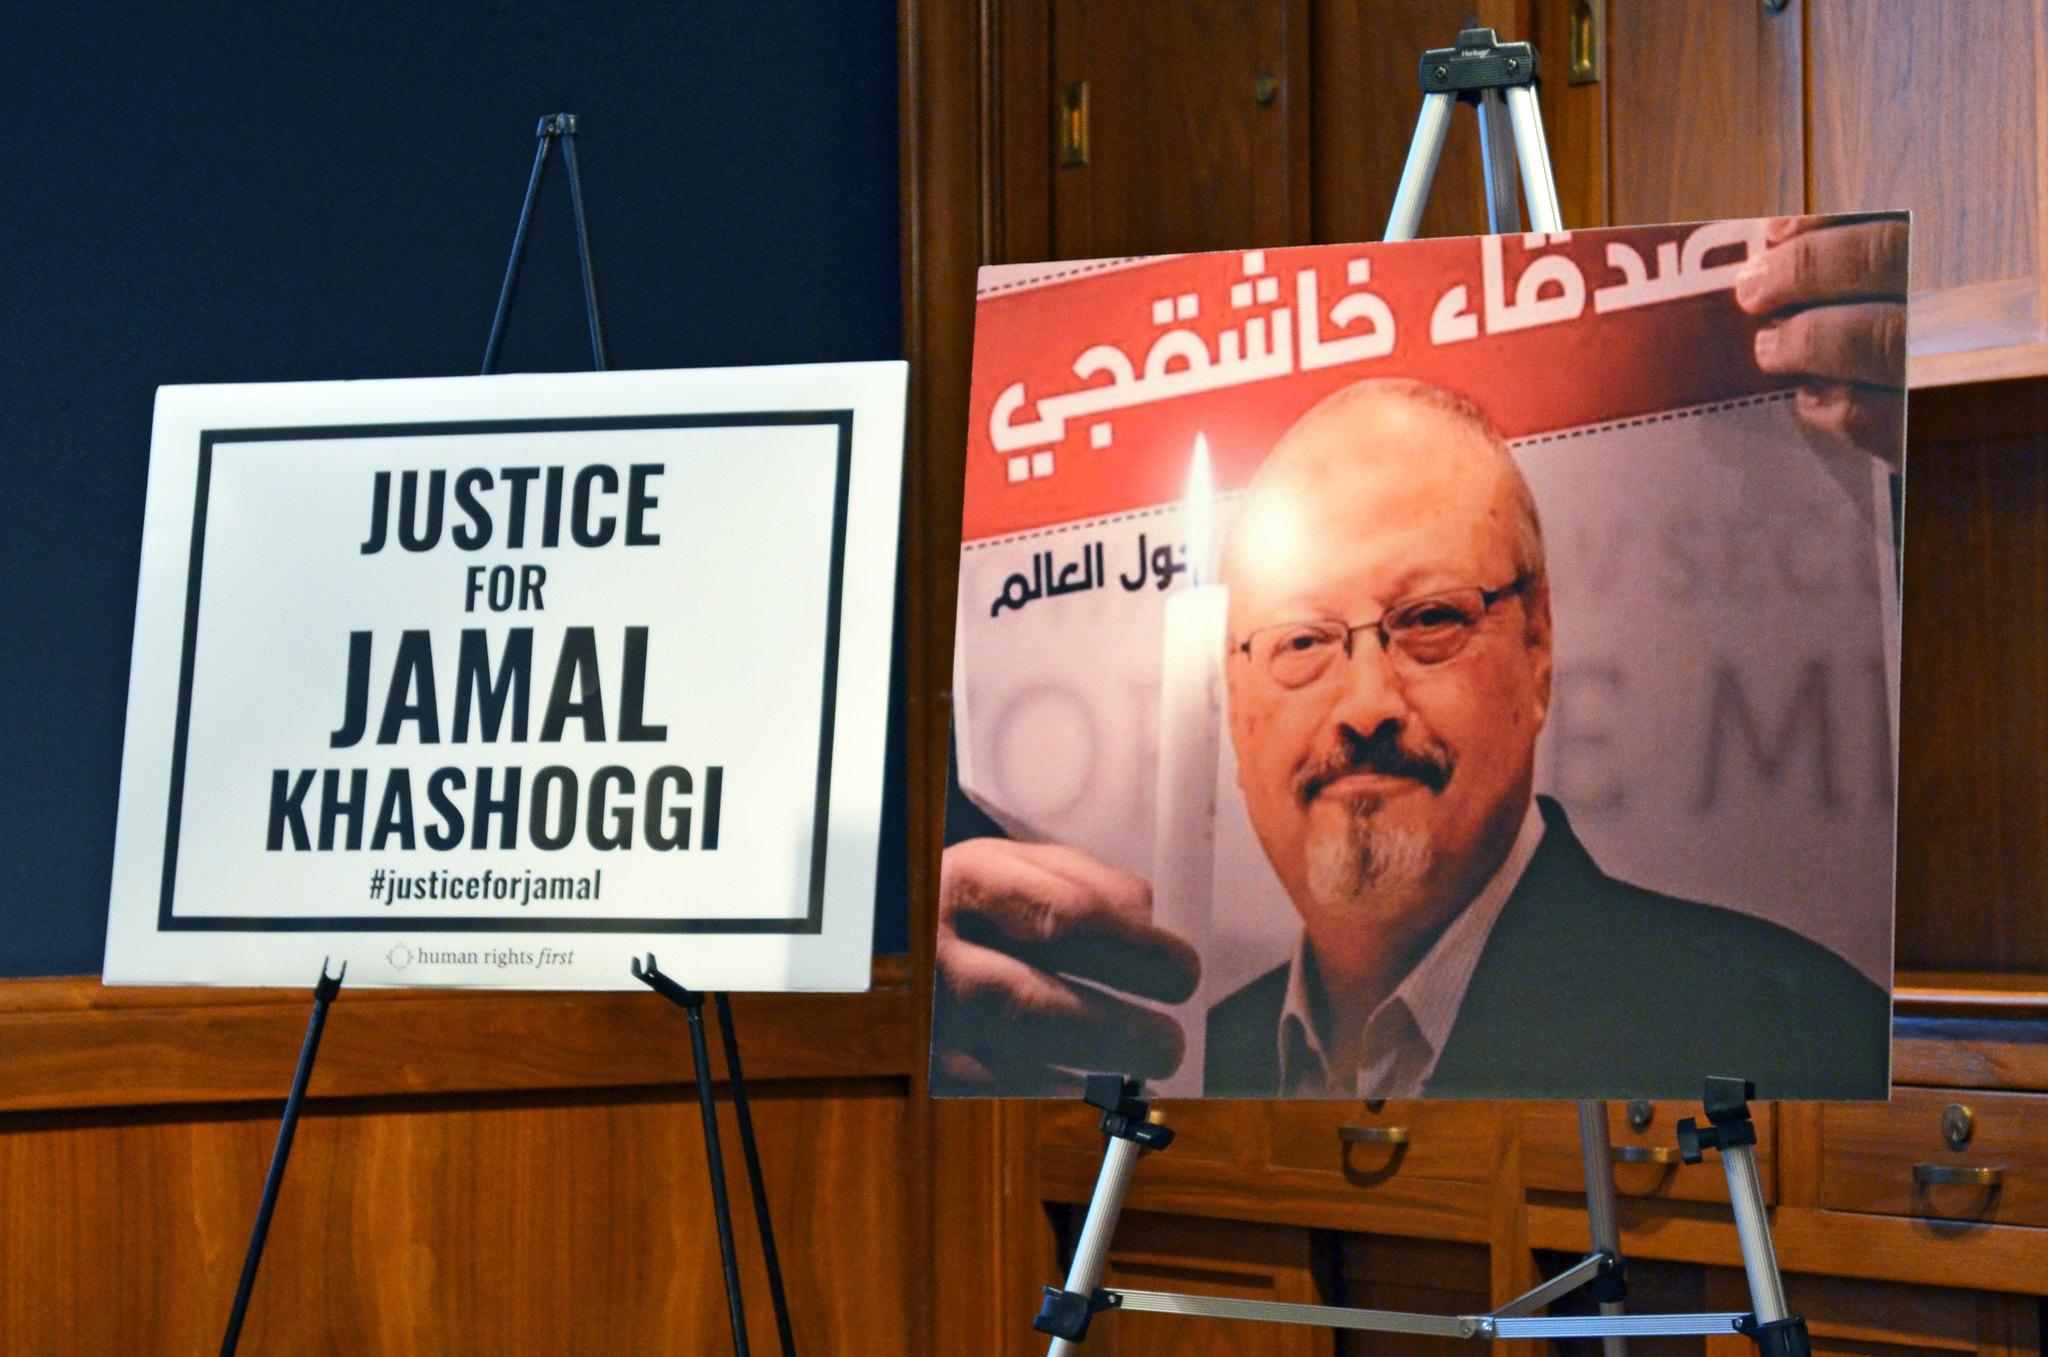 Nessuna giustizia per Jamal Khashoggi